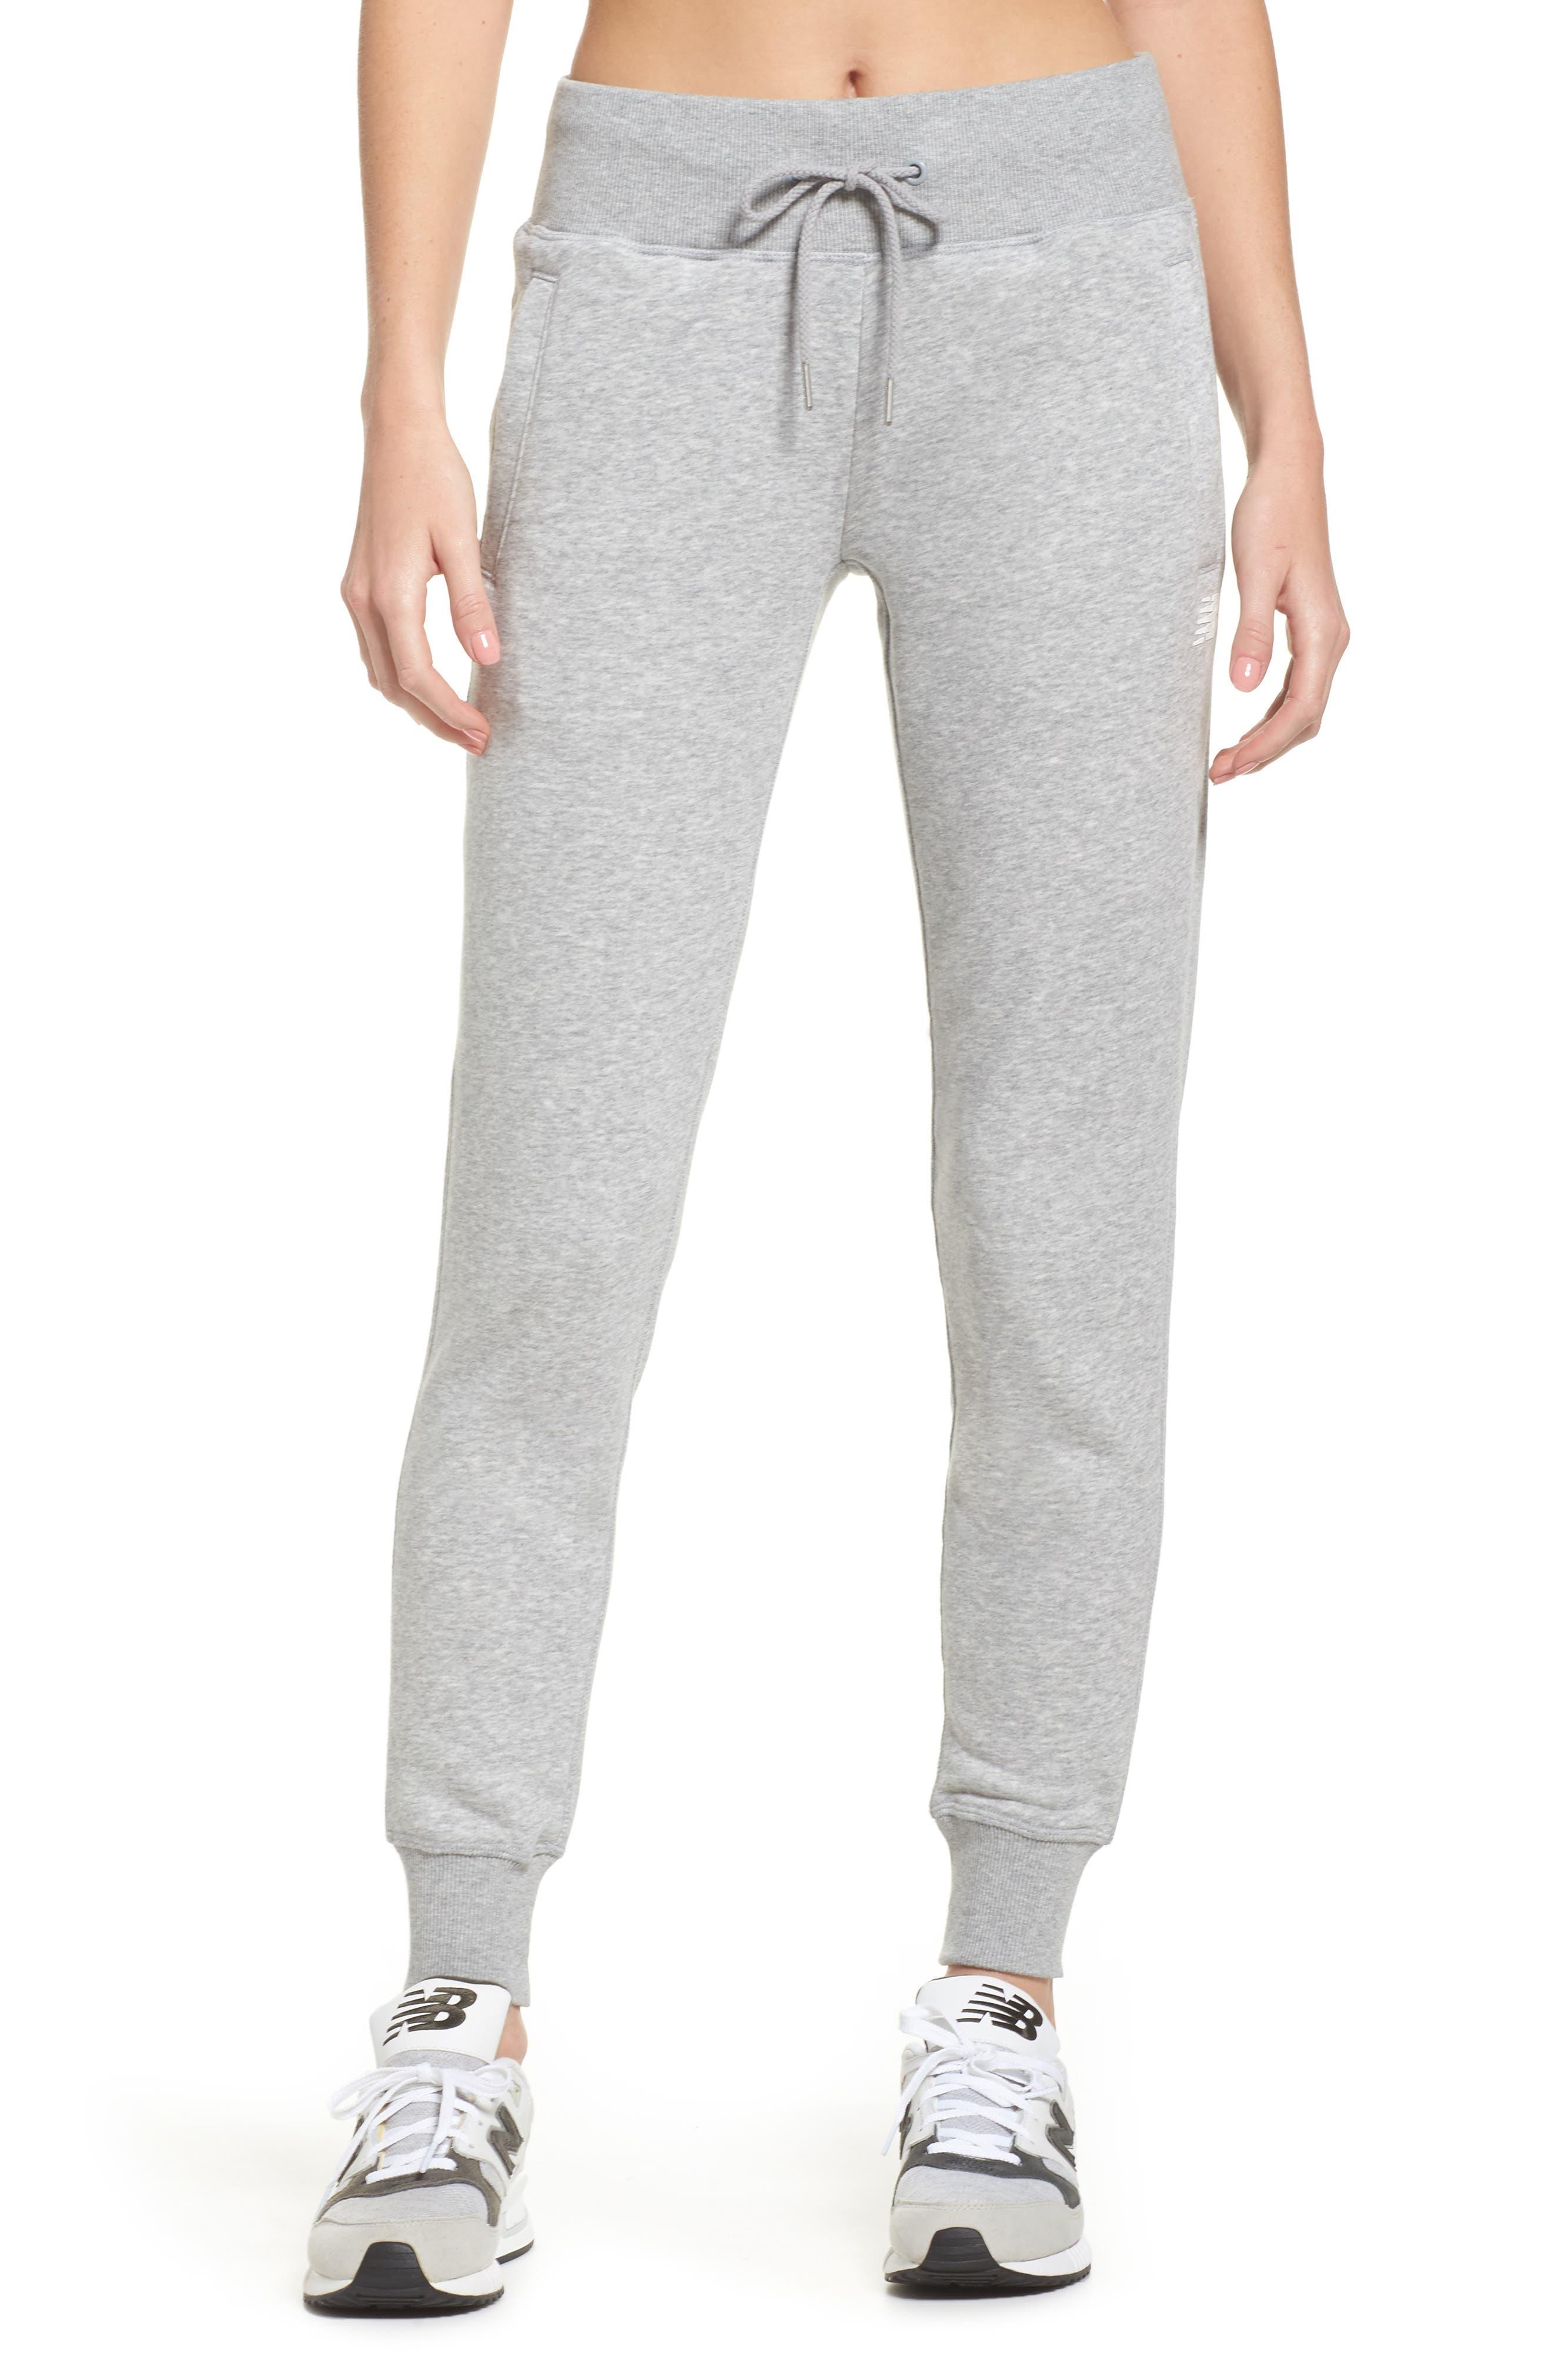 Essentials Sweatpants,                         Main,                         color, Athletic Grey